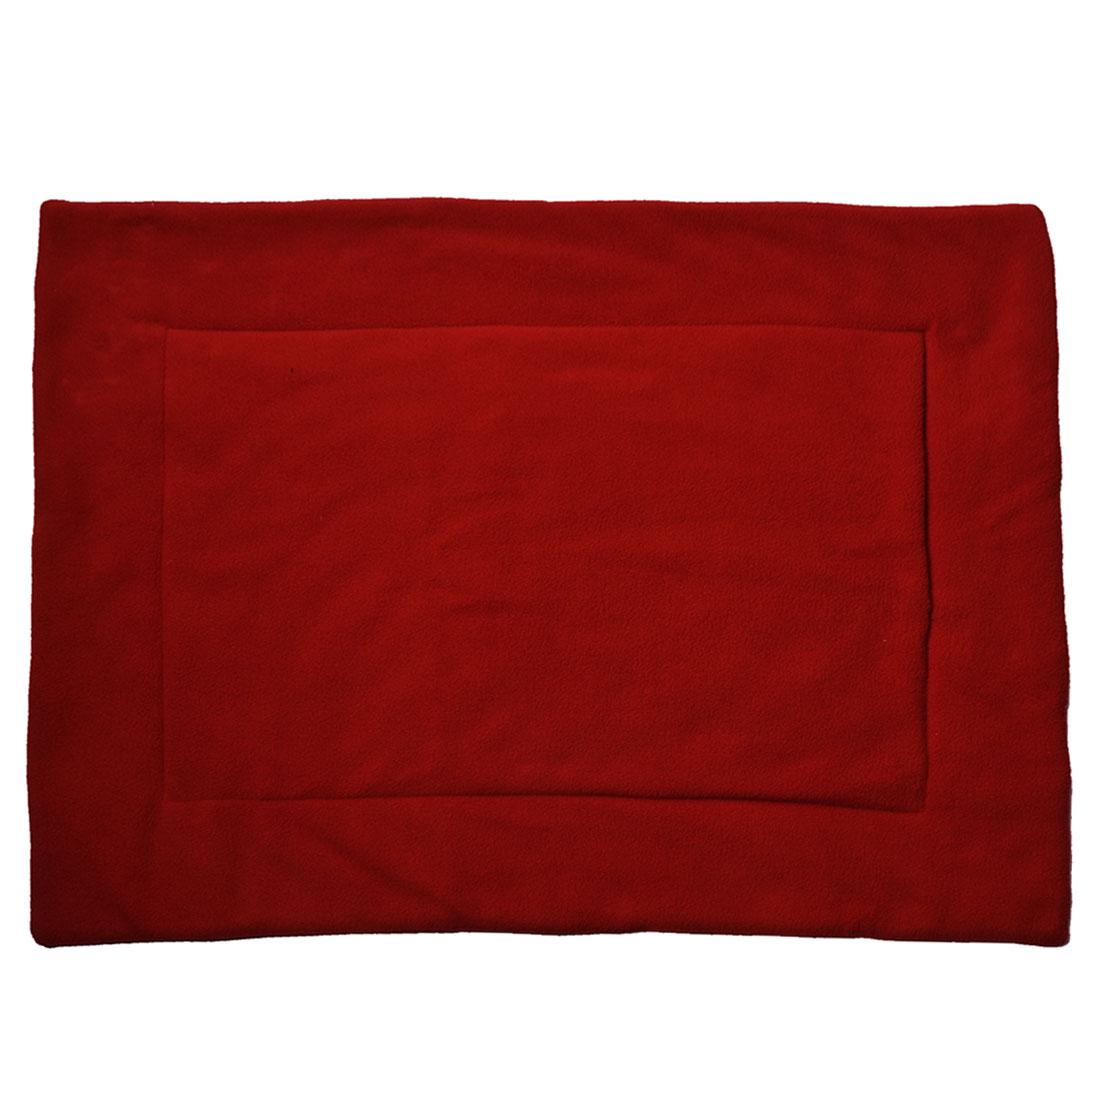 Pet Cat Dog Cotton Blend Rectangular Winter Warm Cushion Pad Mat 70cm x 56cm Red